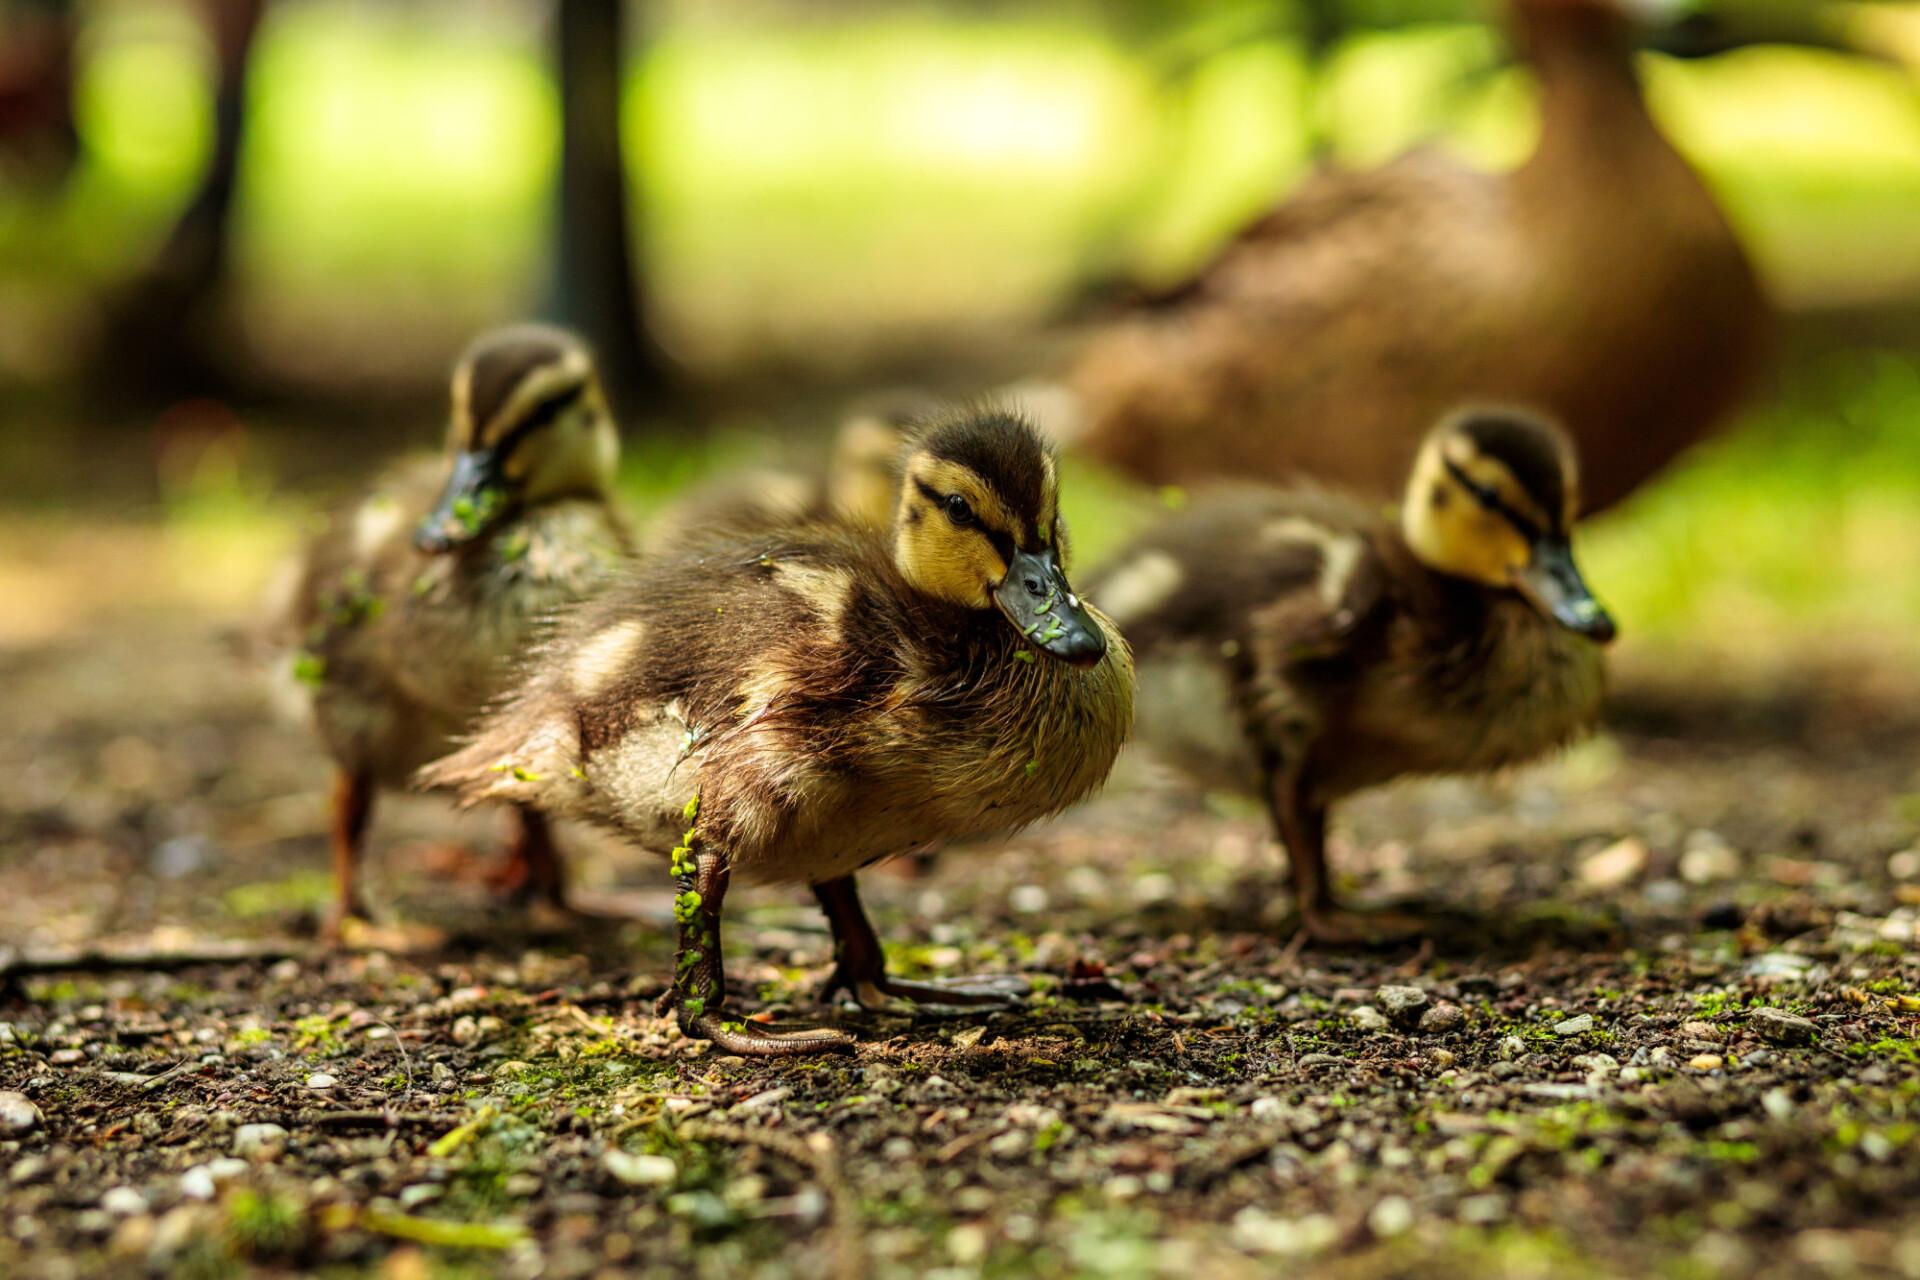 Beautiful cute little duckling - Ducks Family